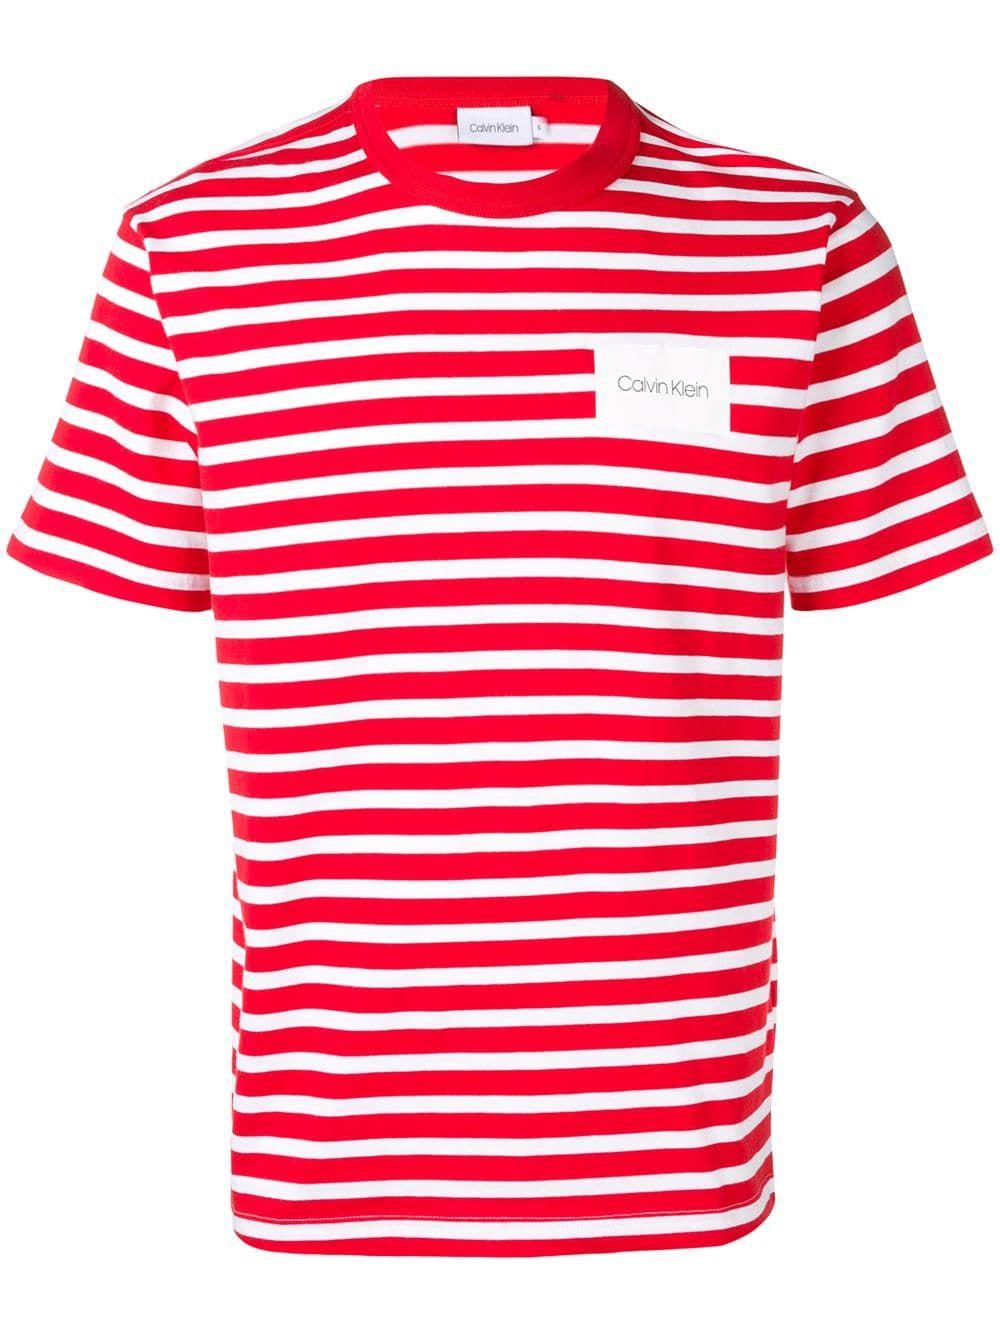 b7b7667e2c4c Calvin Klein striped T-shirt - Red in 2019 | Products | Calvin klein ...